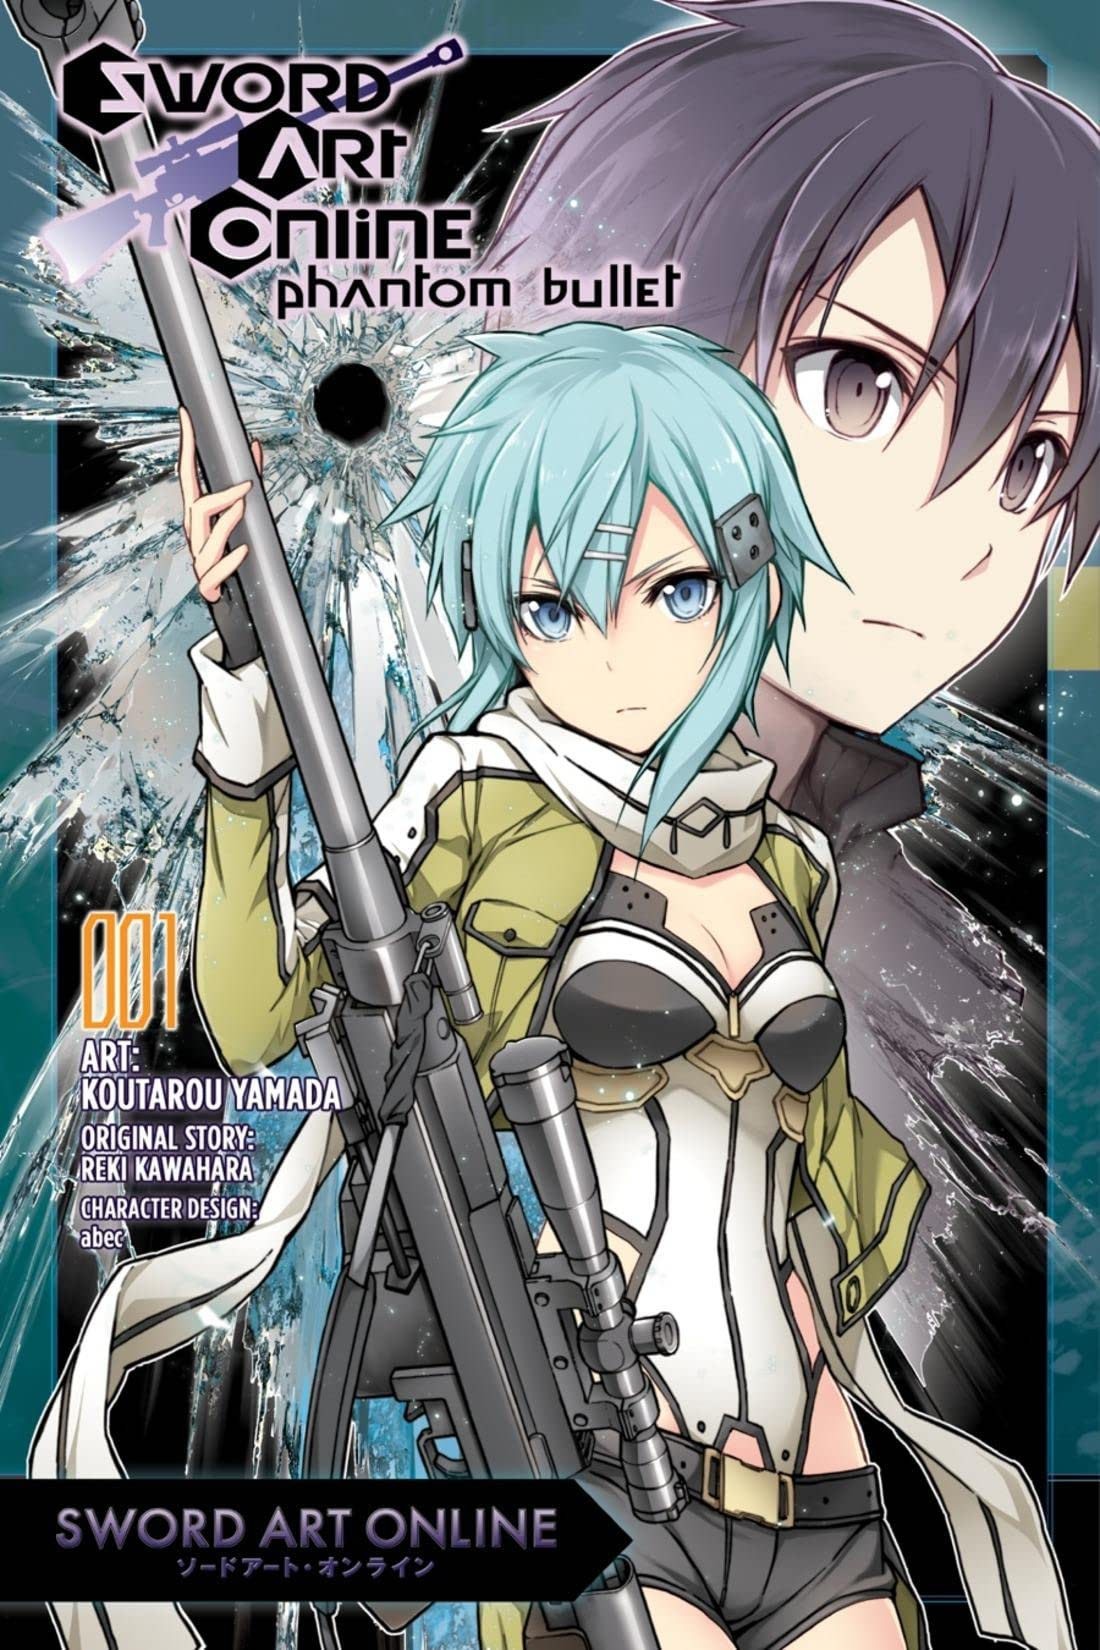 Sword Art Online: Phantom Bullet Vol. 1